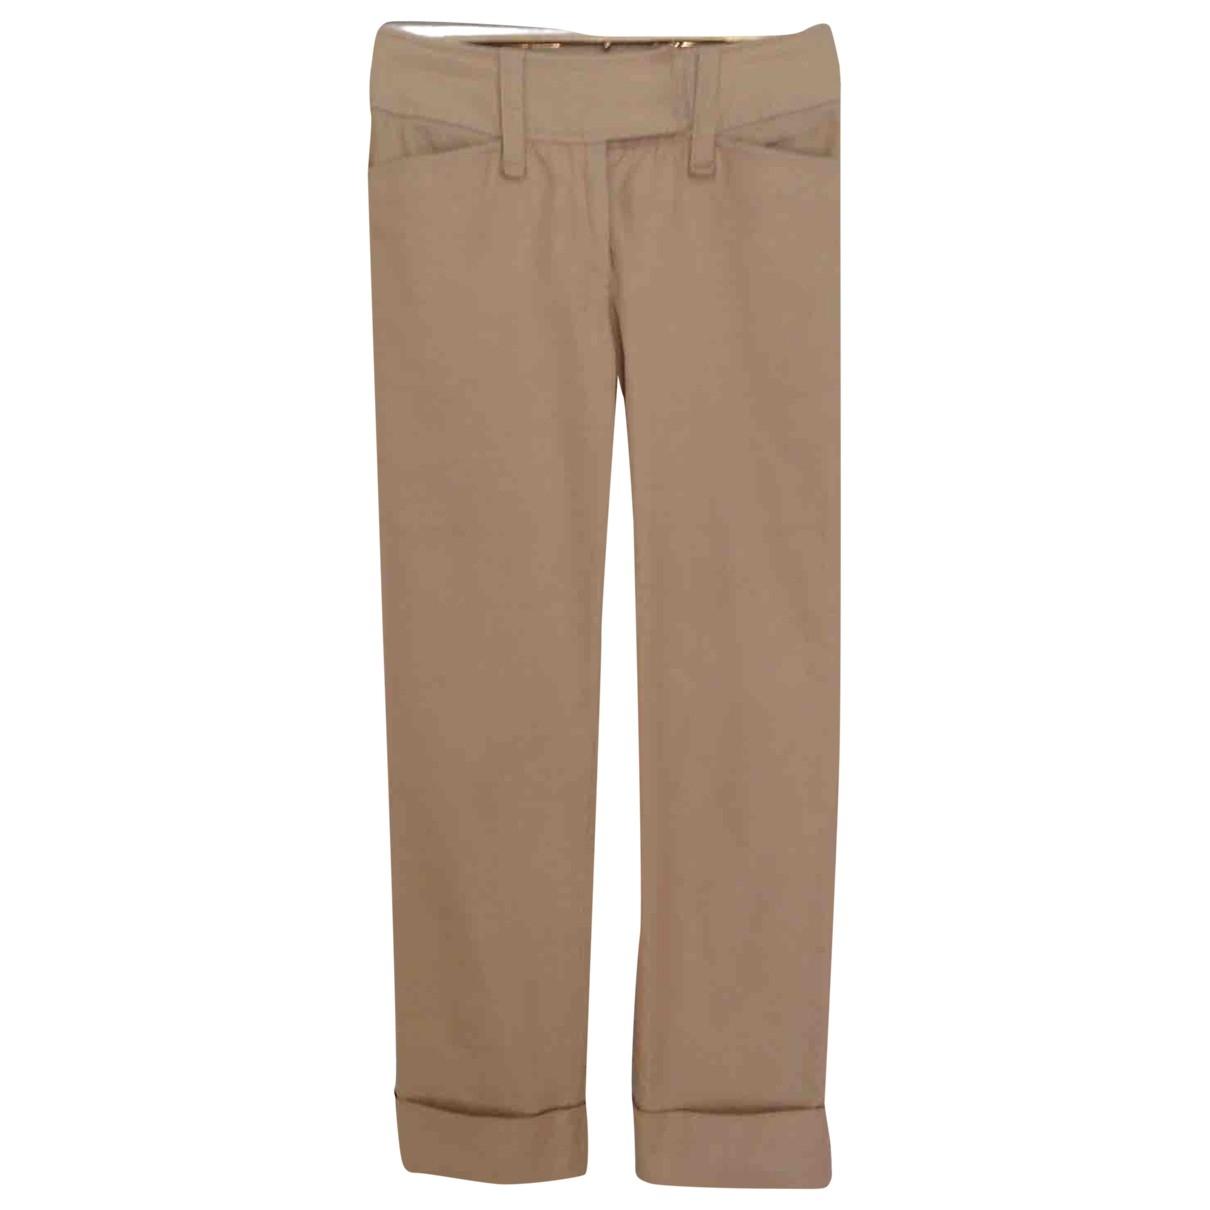 D&g \N Khaki Cotton Trousers for Women 40 IT